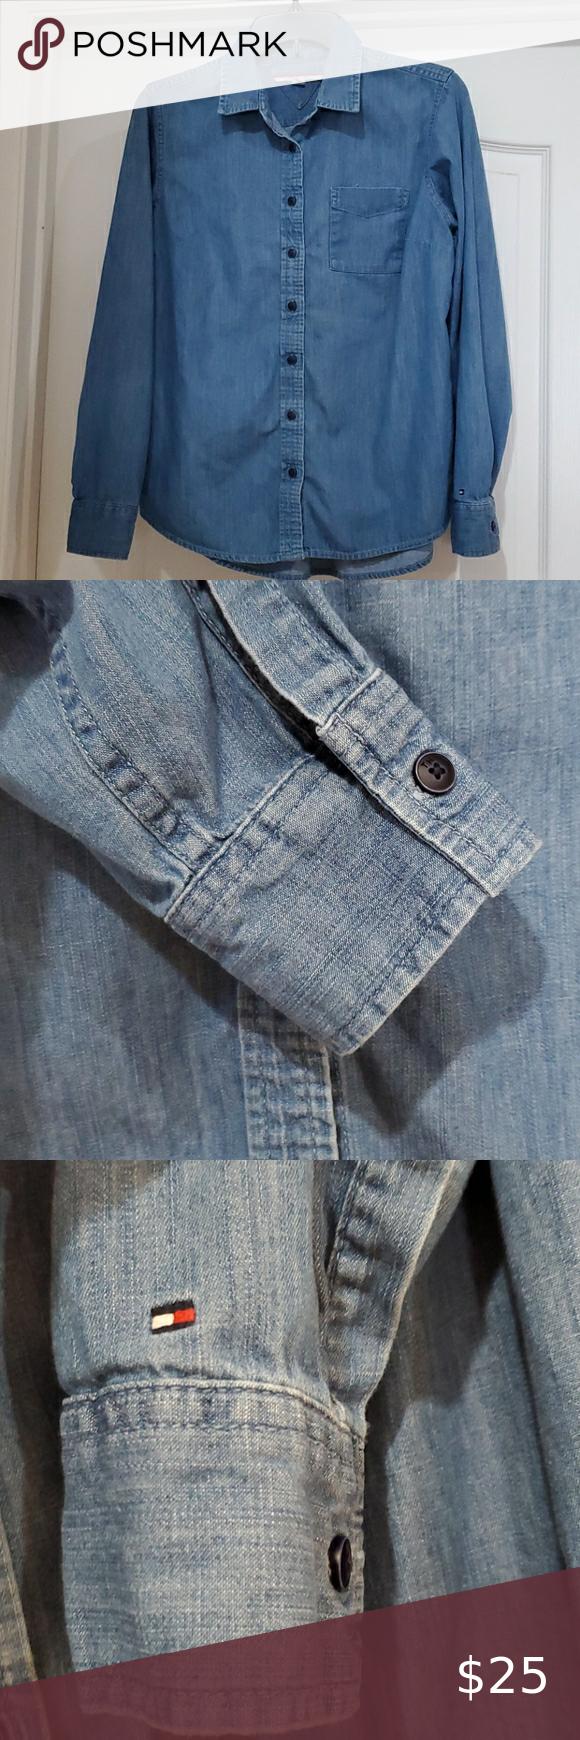 Vintage Large Size Denim Skirt Womens Shirt Embroidered Denim Shirt Long Sleeve Button Up Cotton Shirt Vintage Chic Blouse Khaki Denim Shirt